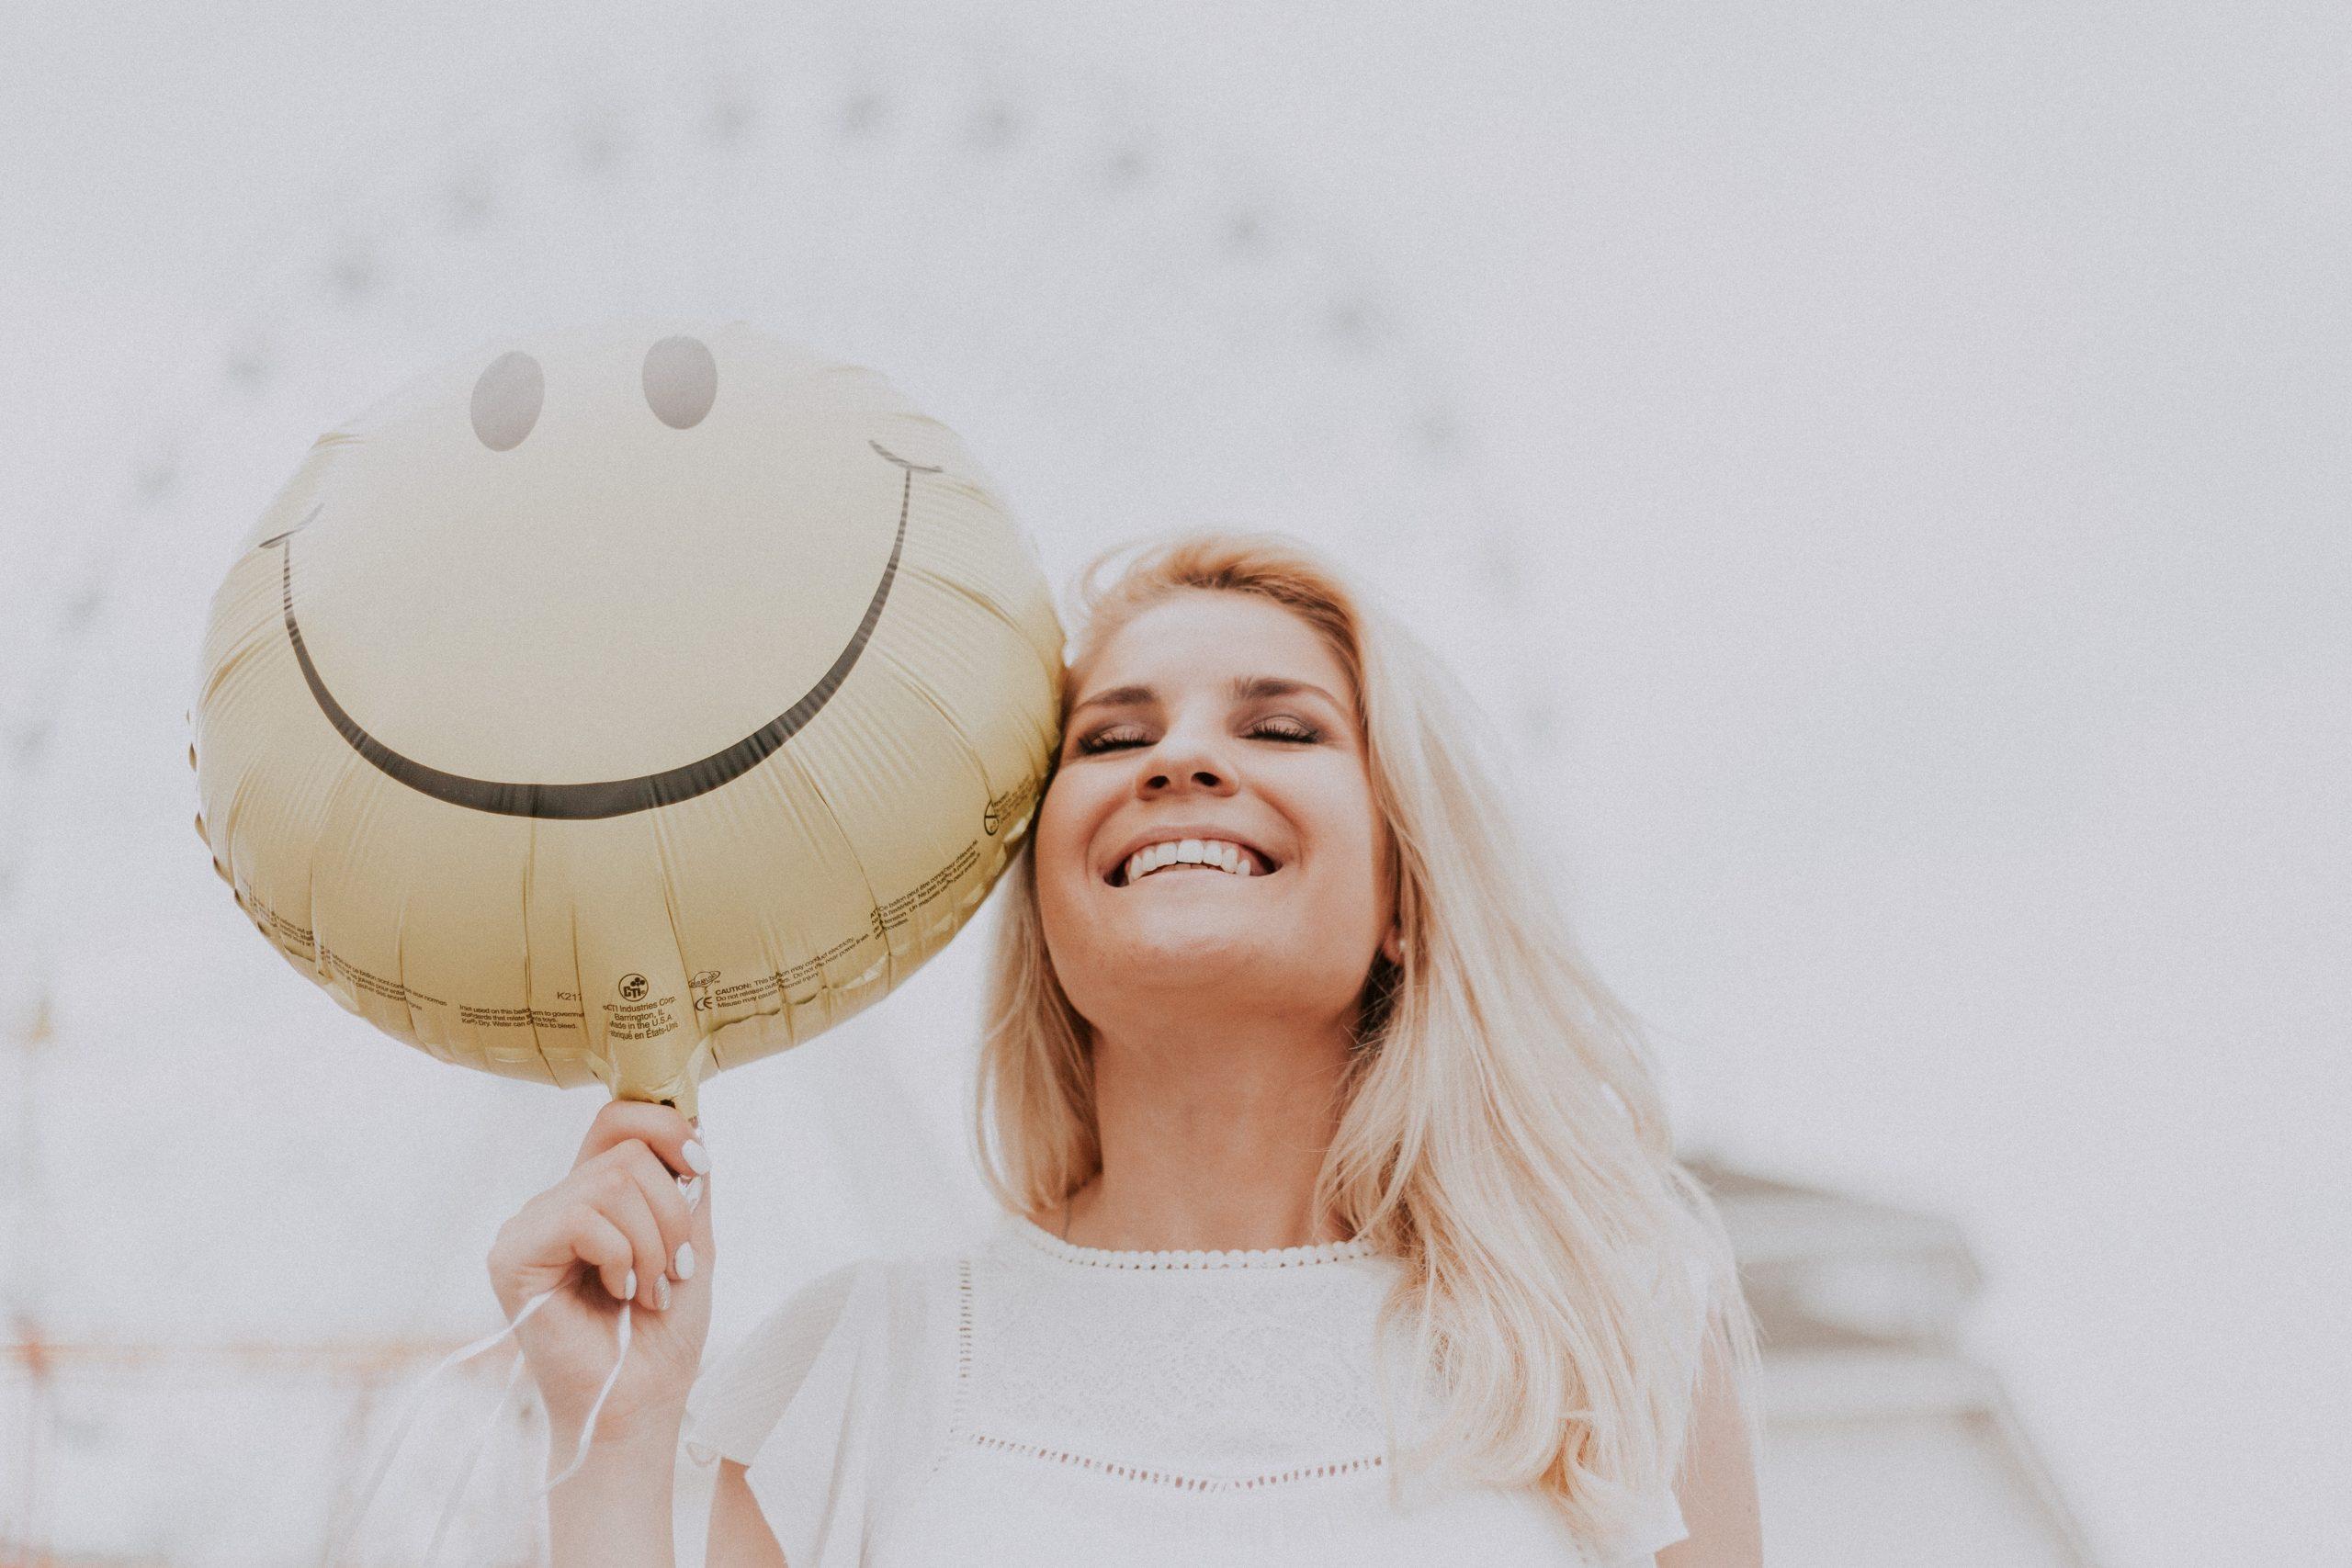 Girl holding balloon smiling